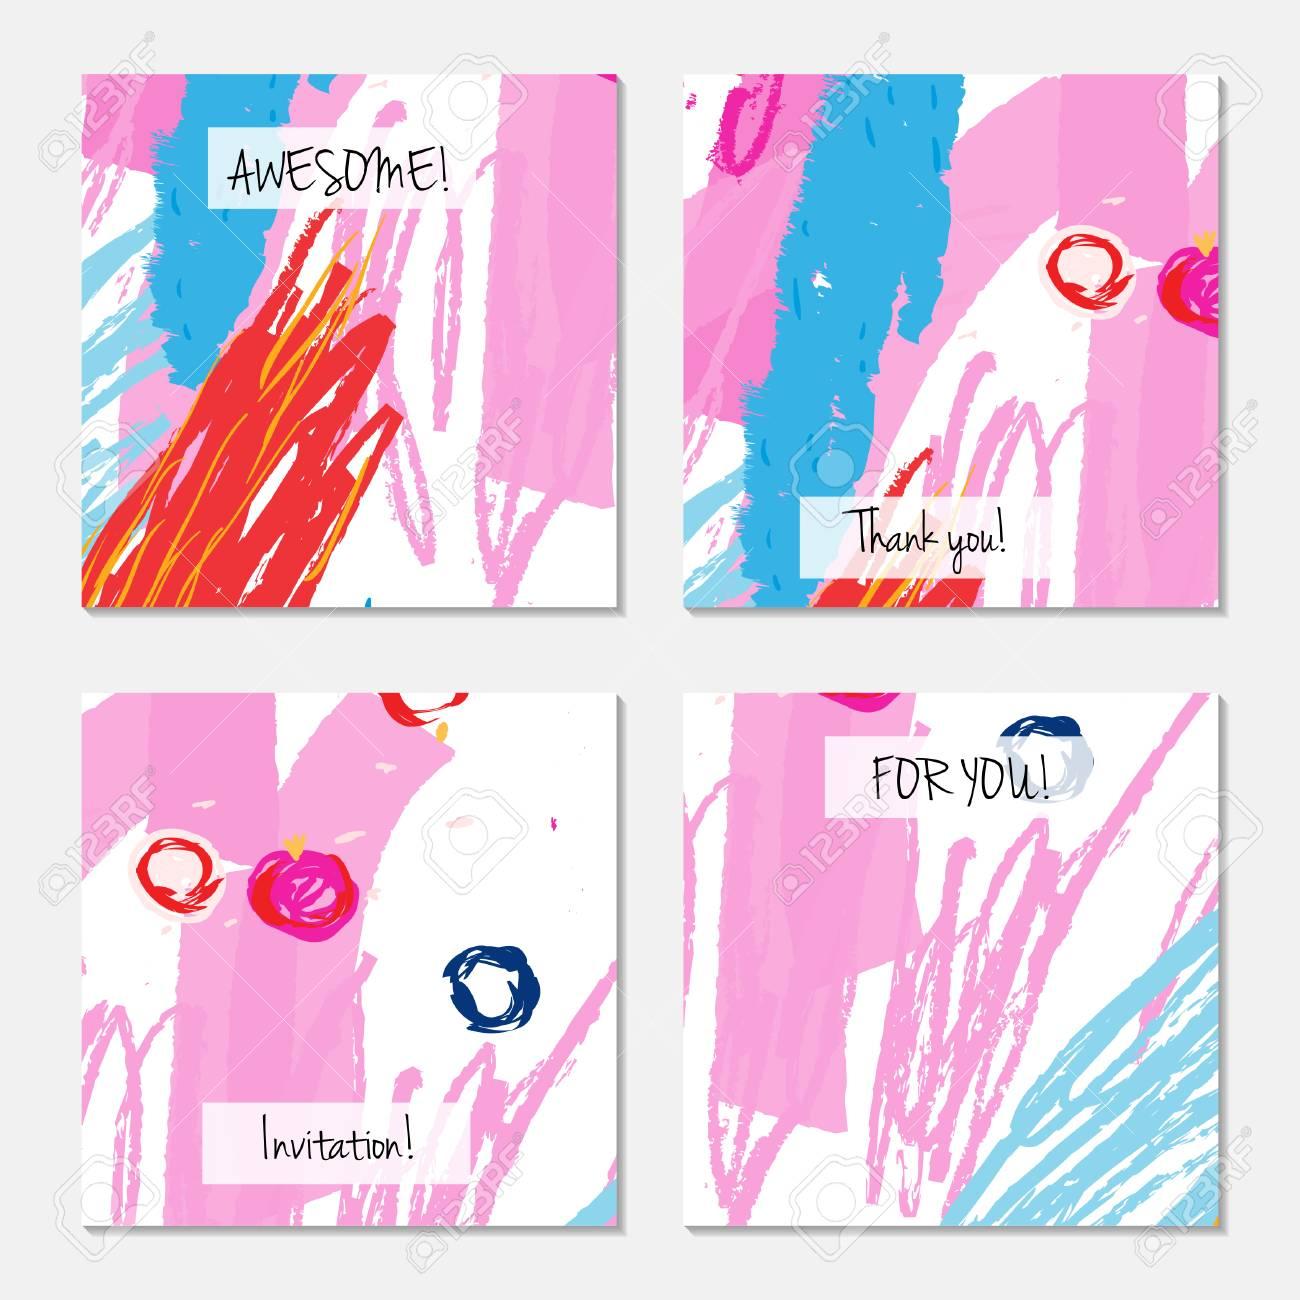 Hand Drawn Creative Universal Invitation Greeting Card Template